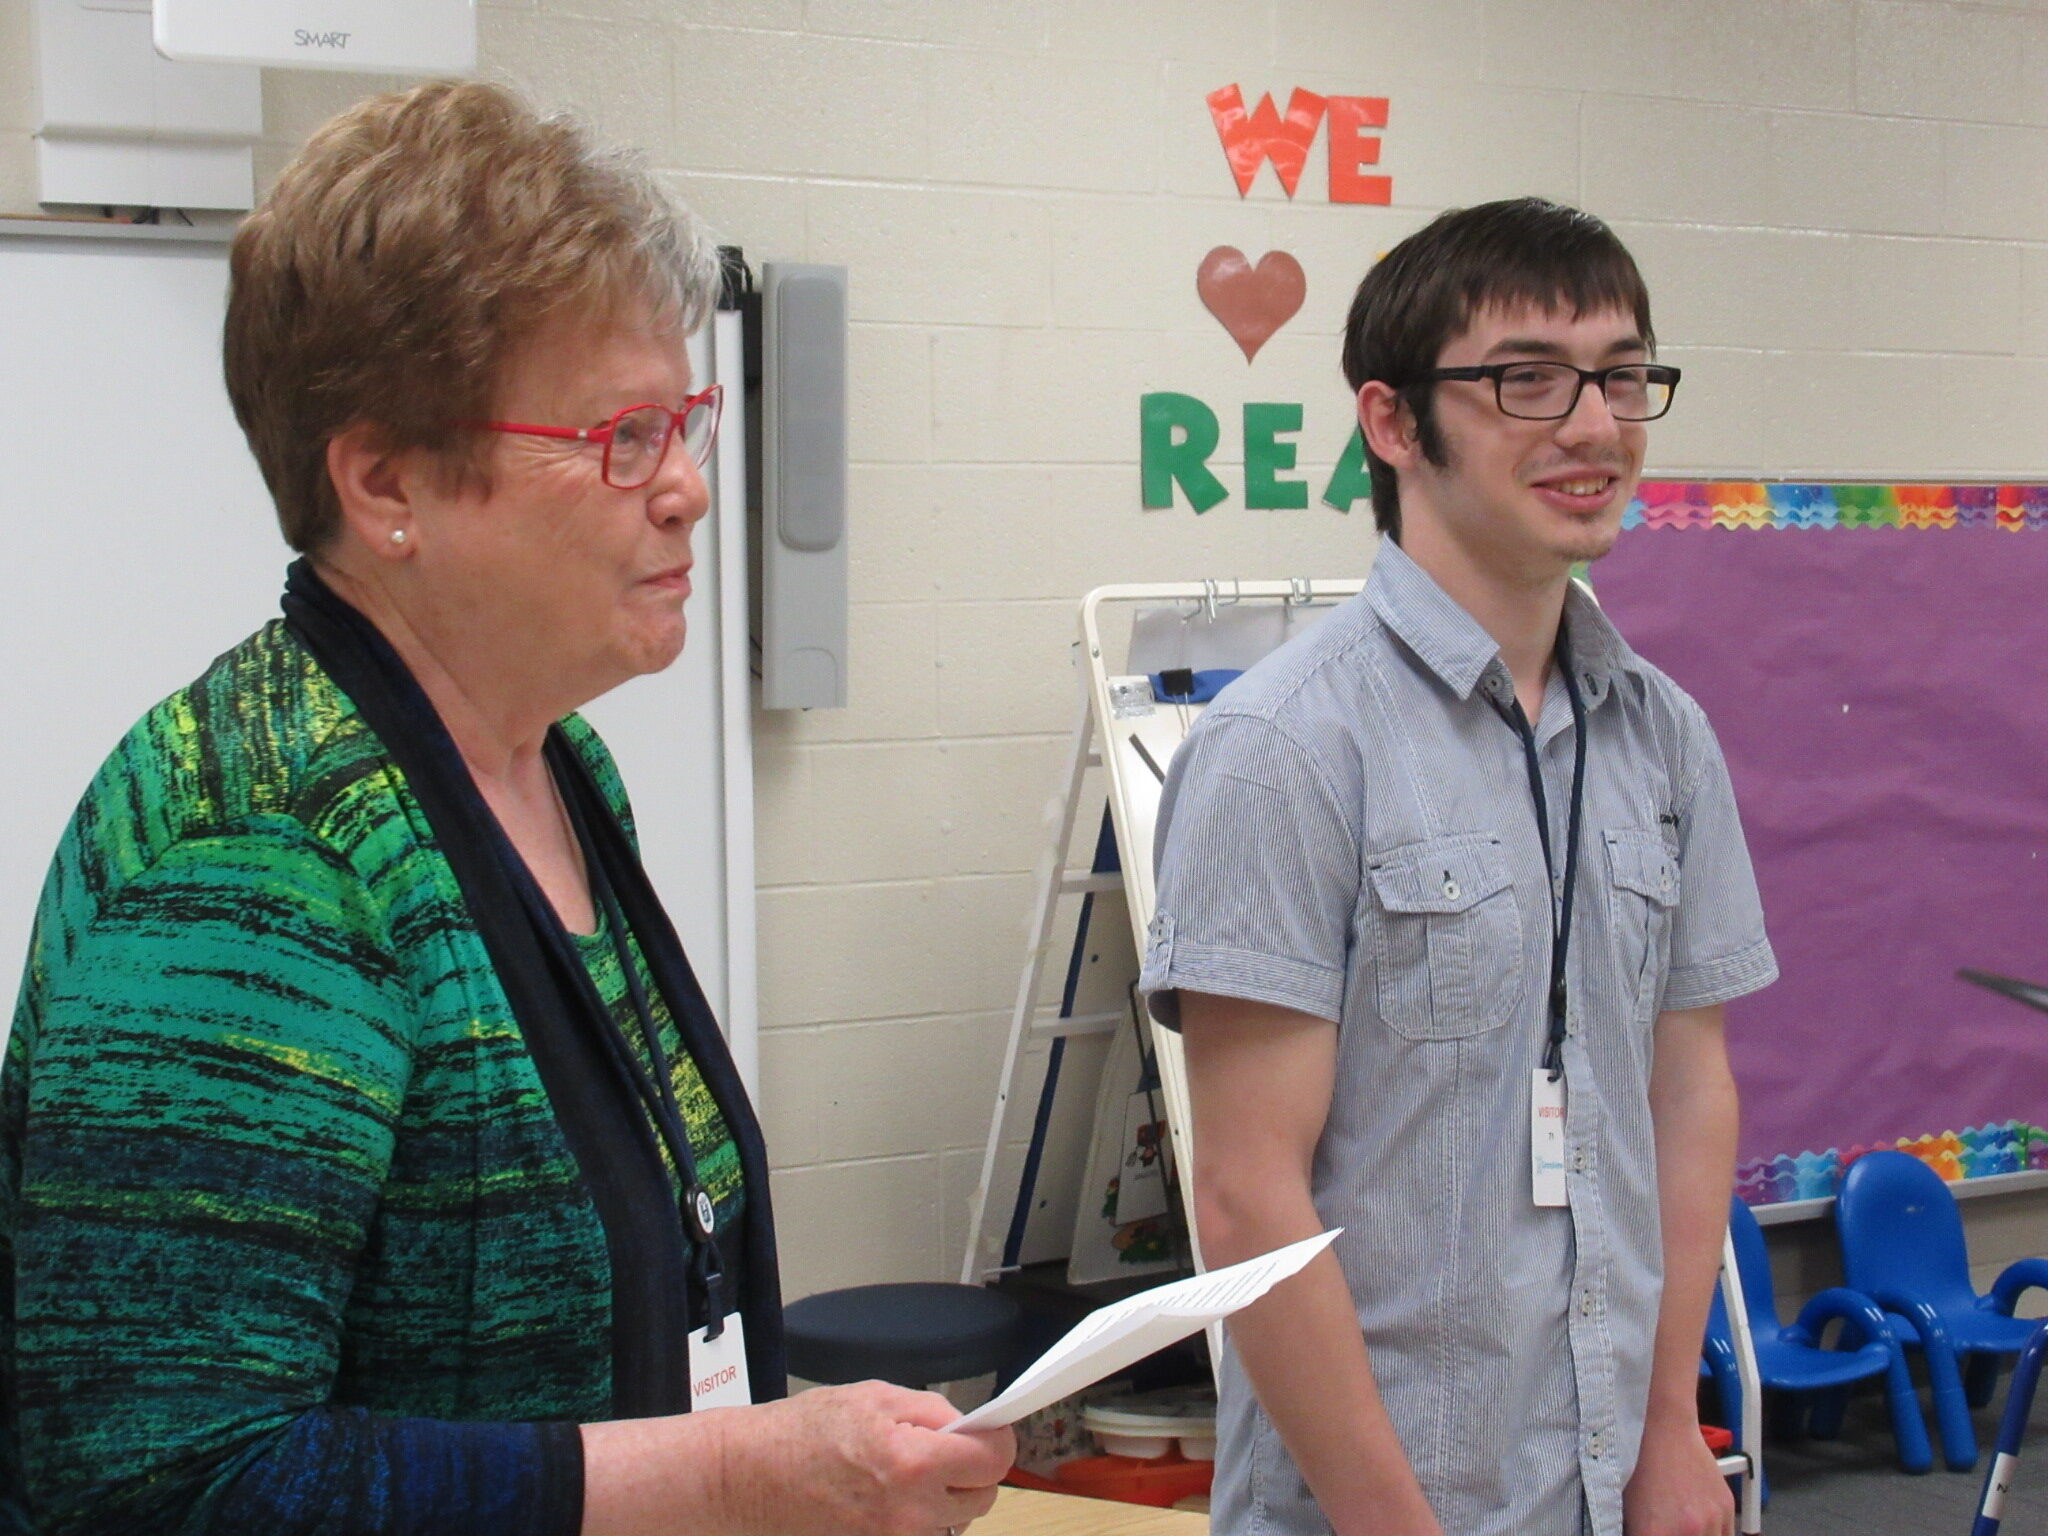 Sam smiles as Ruth presents award